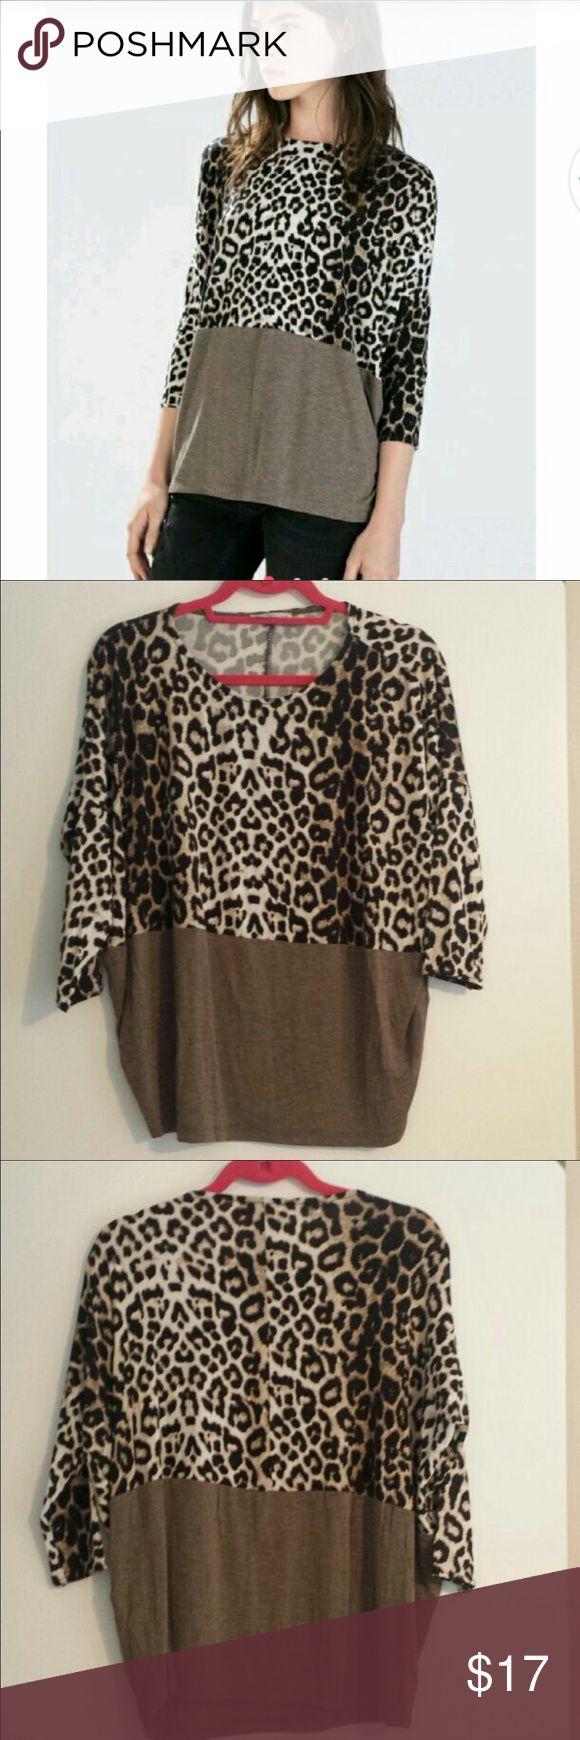 Zara tshirt S Great condition tshirt size Small loose Zara Tops Tees - Long Sleeve